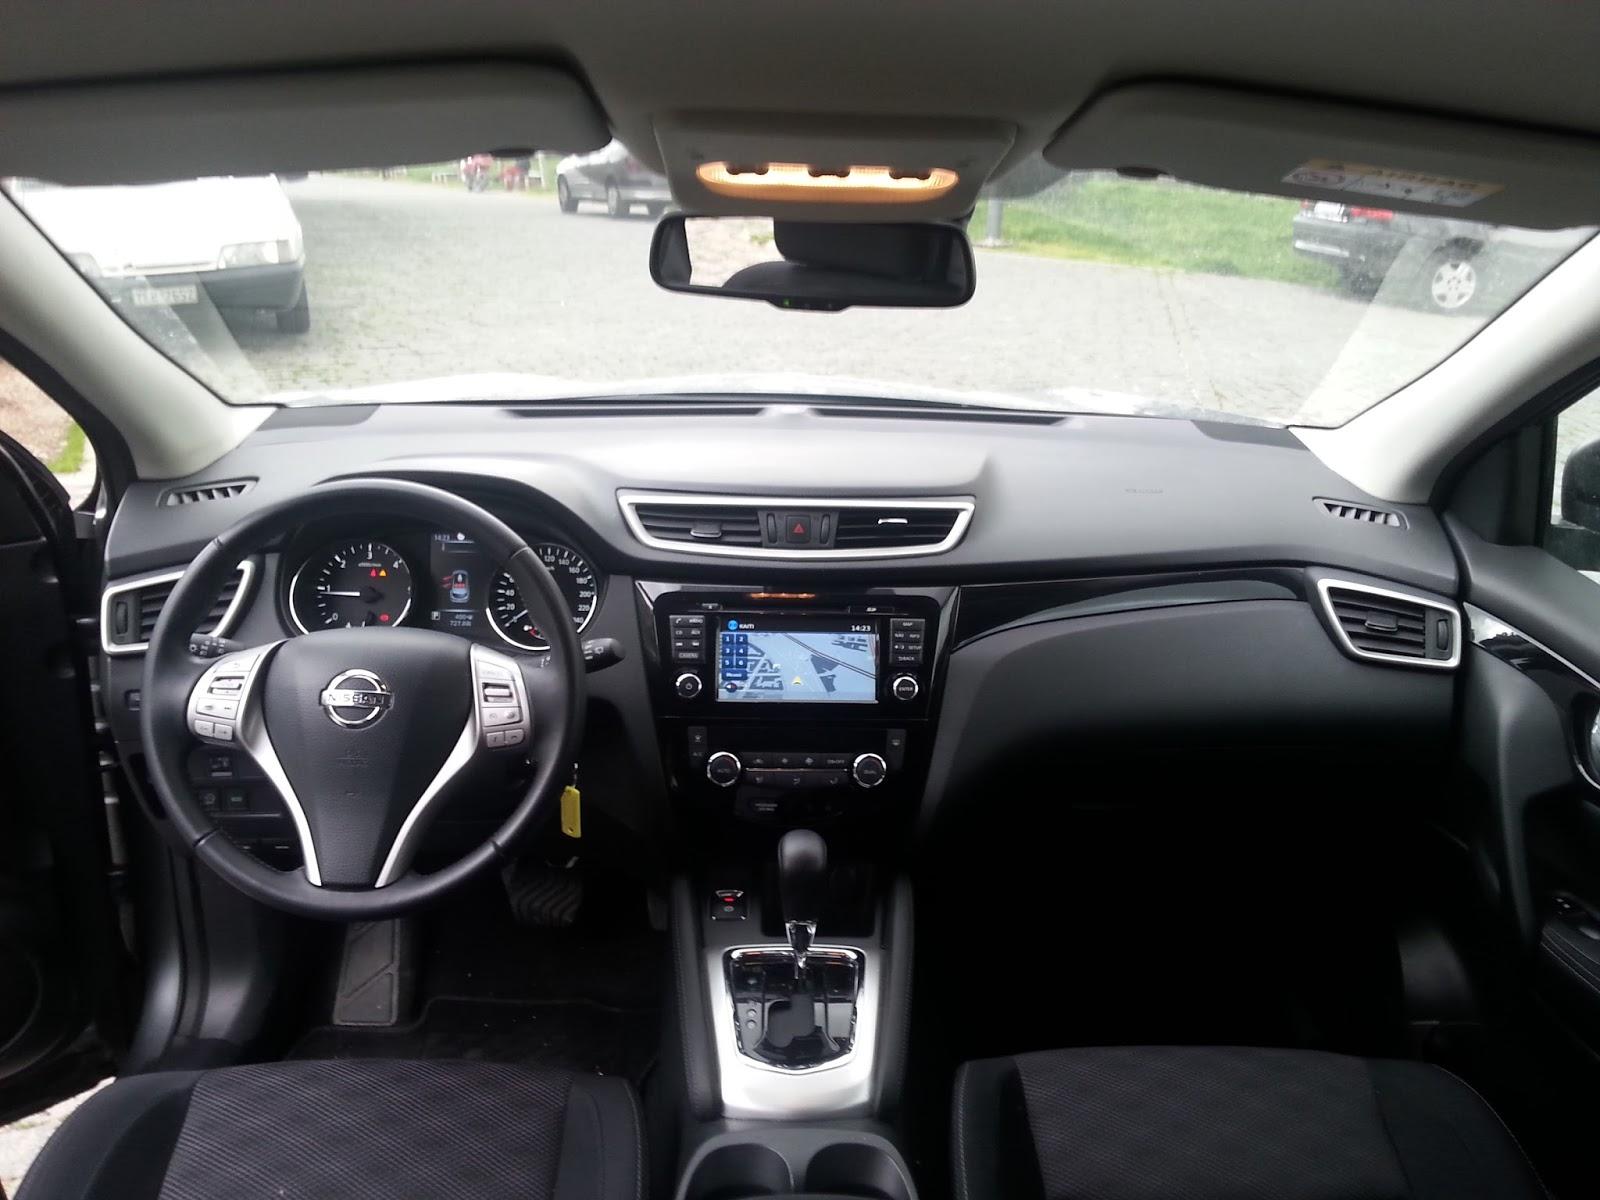 F3 Οδηγούμε (παντού) το Nissan Qashqai Nissan, Nissan Qashqai, TEST, ΔΟΚΙΜΕΣ